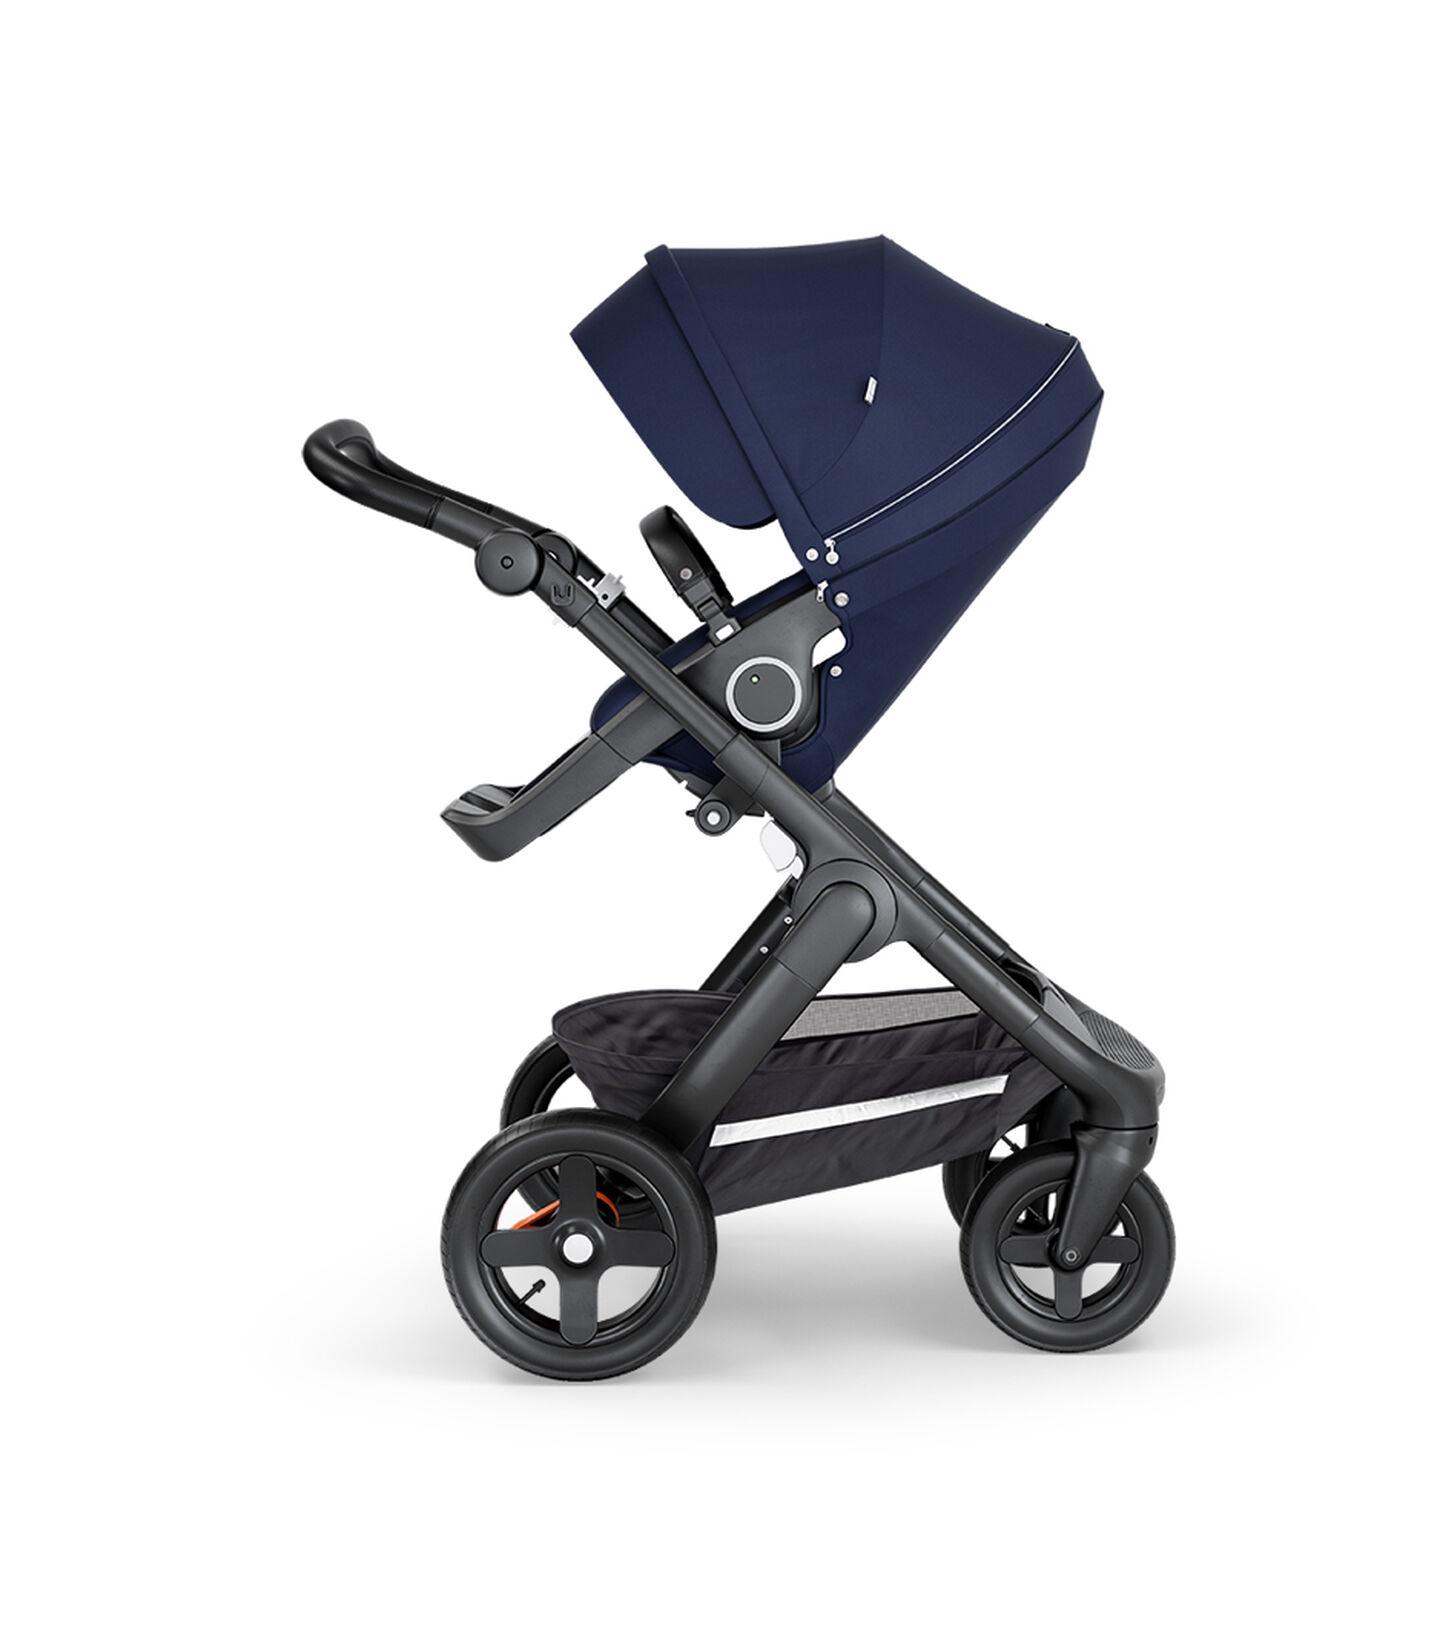 Stokke® Trailz™ with Black Chassis, Black Leatherette and Terrain Wheels. Stokke® Stroller Seat, Deep Blue.